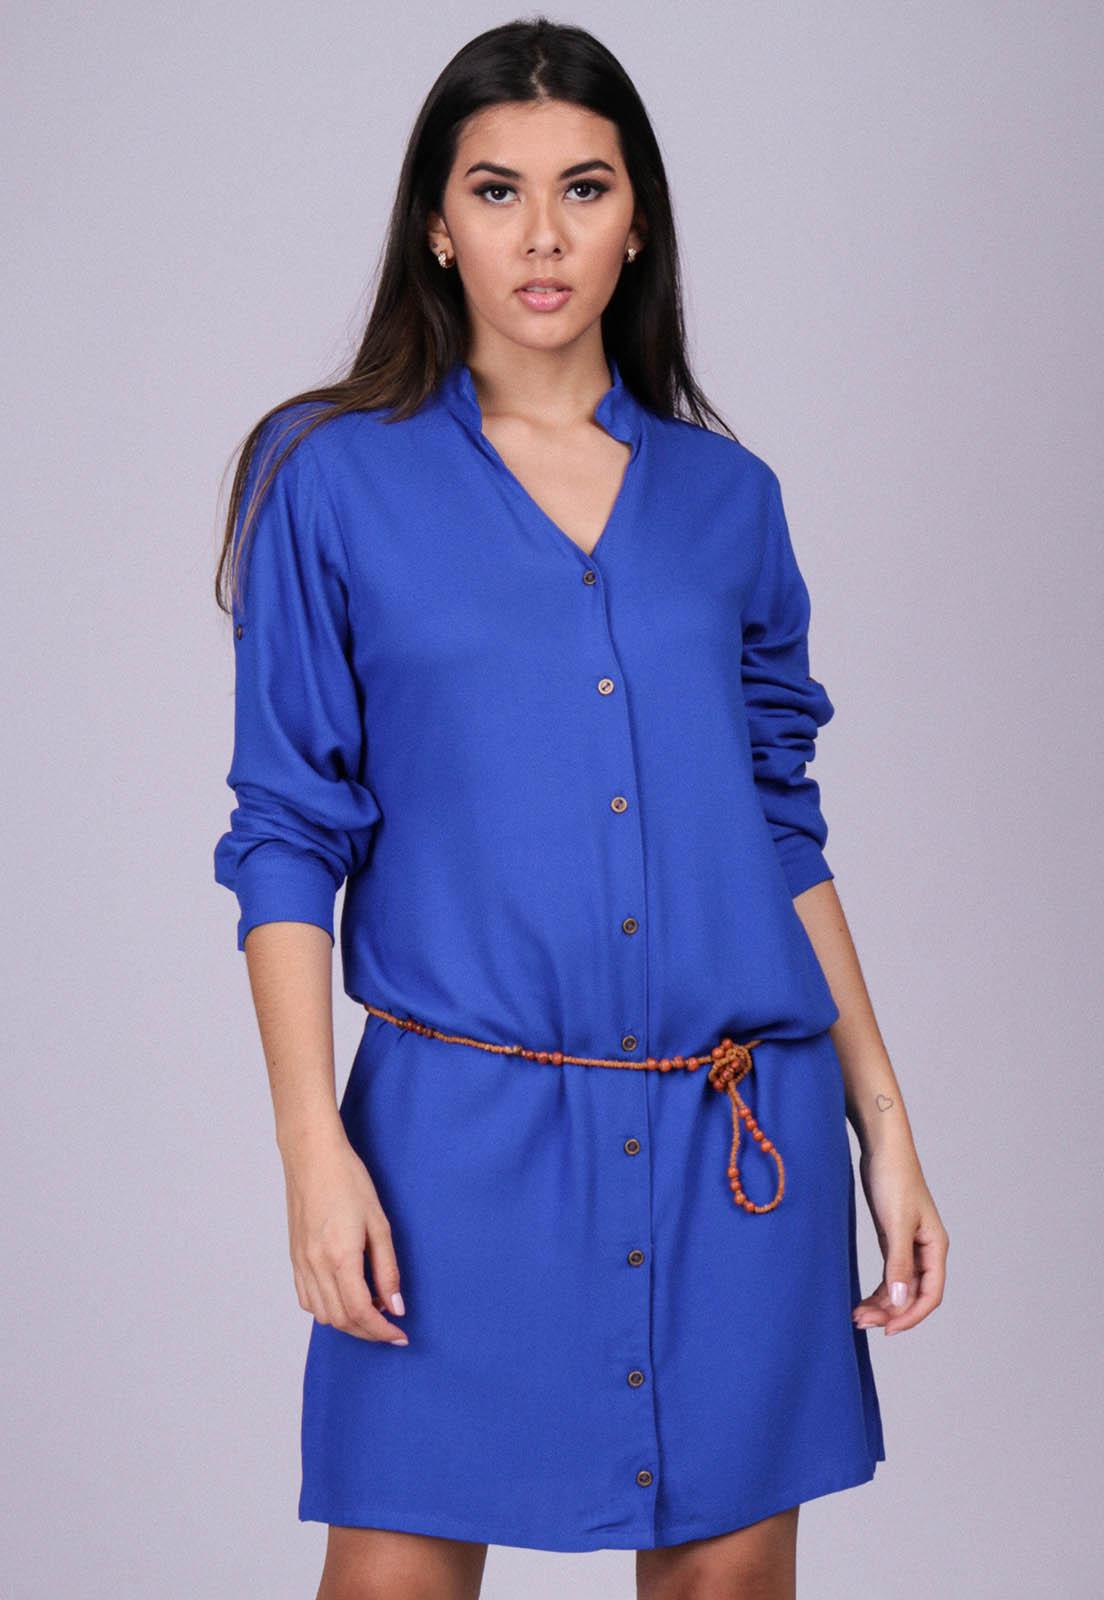 Vestido Chemise Viscose Manga Longa Azul Bic